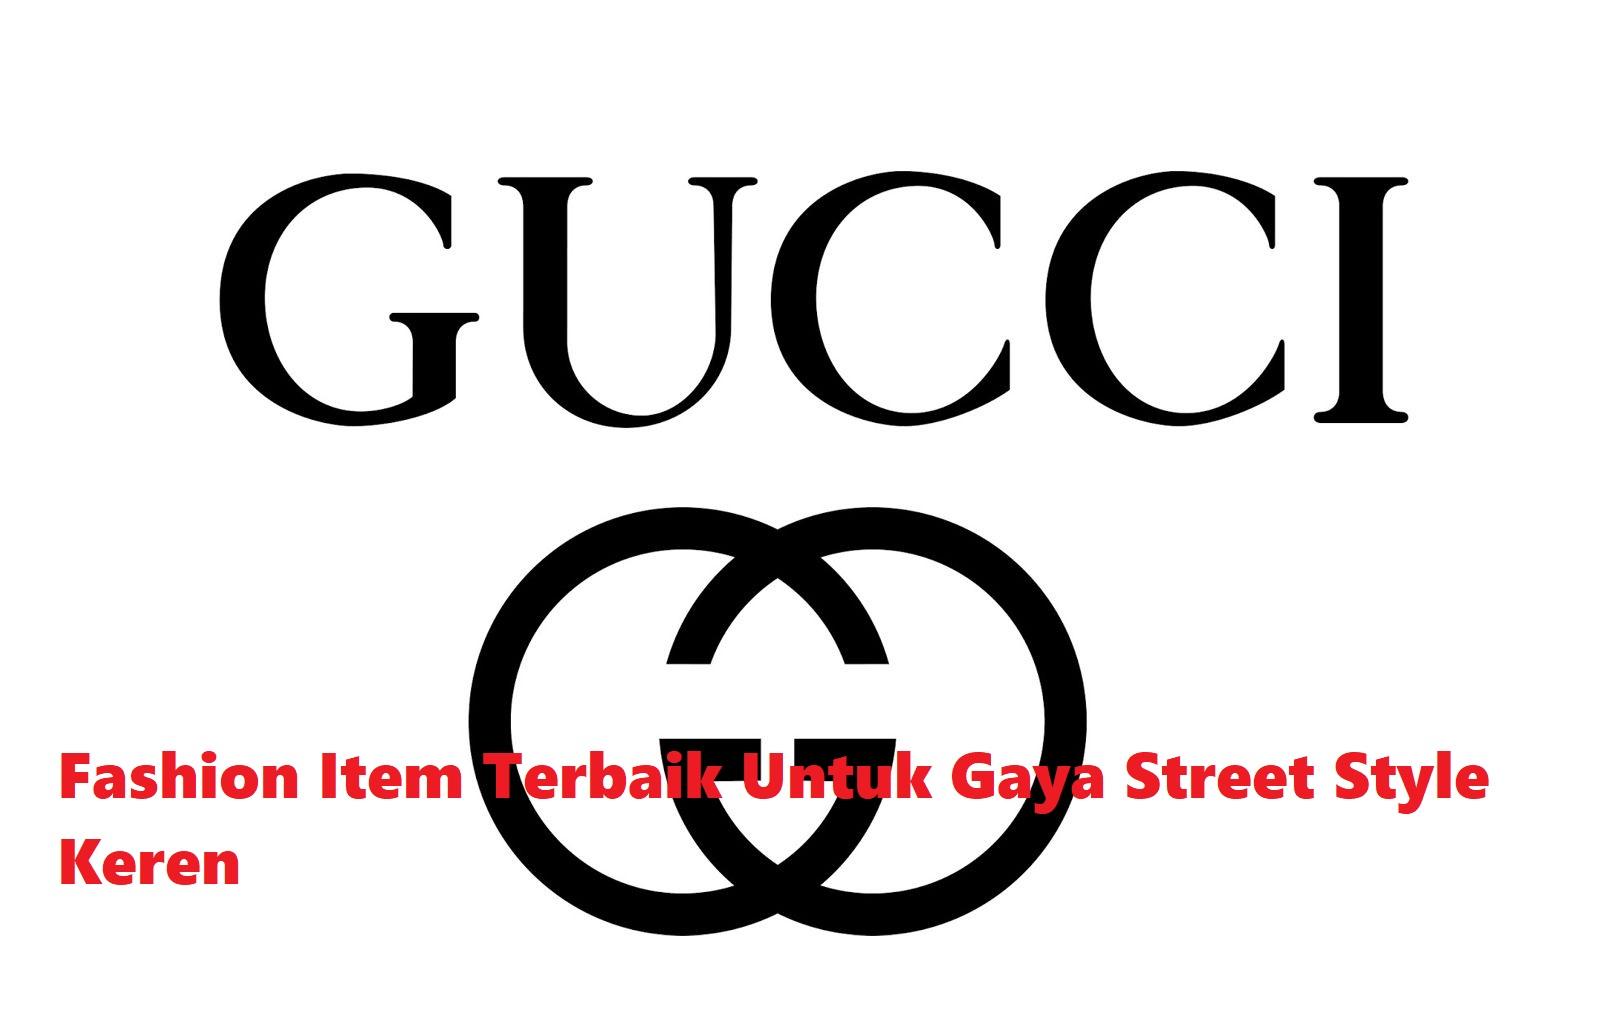 Fashion Item Terbaik Untuk Gaya Street Style Keren